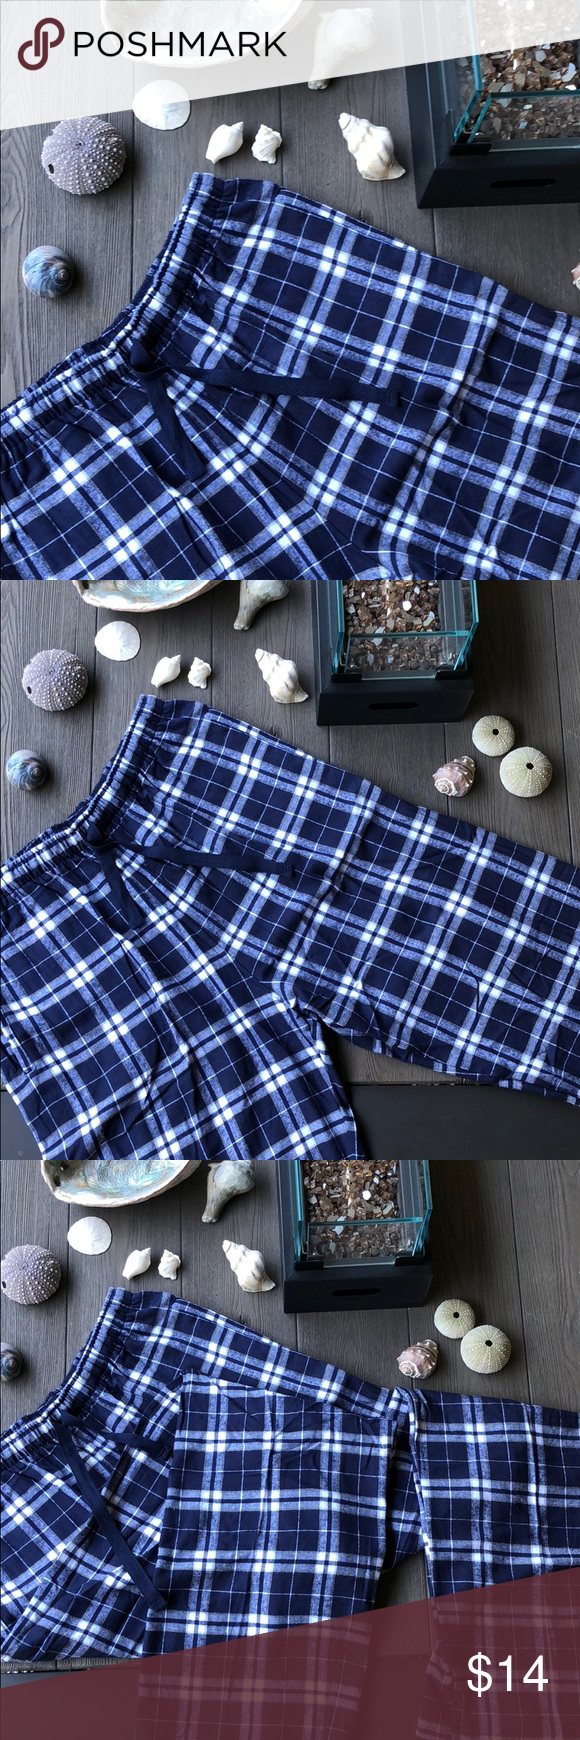 Gangster flannel shirts  Flannel pants NWT  My Posh Closet  Pinterest  Surf brands